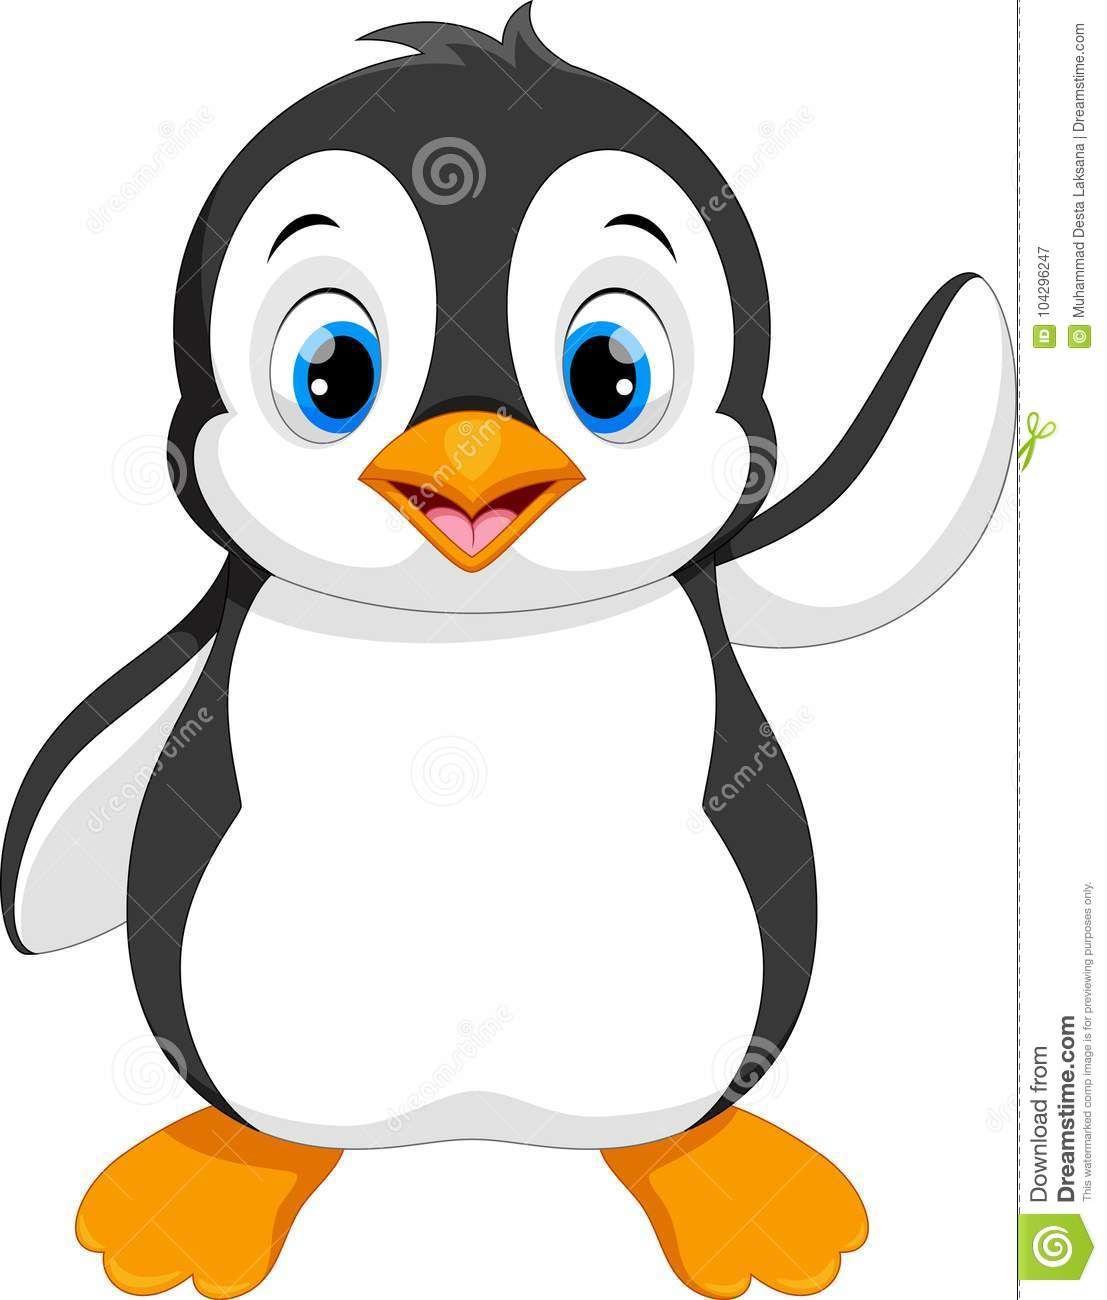 Illustration About Vector Illustration Of Cute Baby Penguin Cartoon Sitting Isolated On White Background Cute Baby Penguin Penguin Cartoon Cute Penguin Cartoon